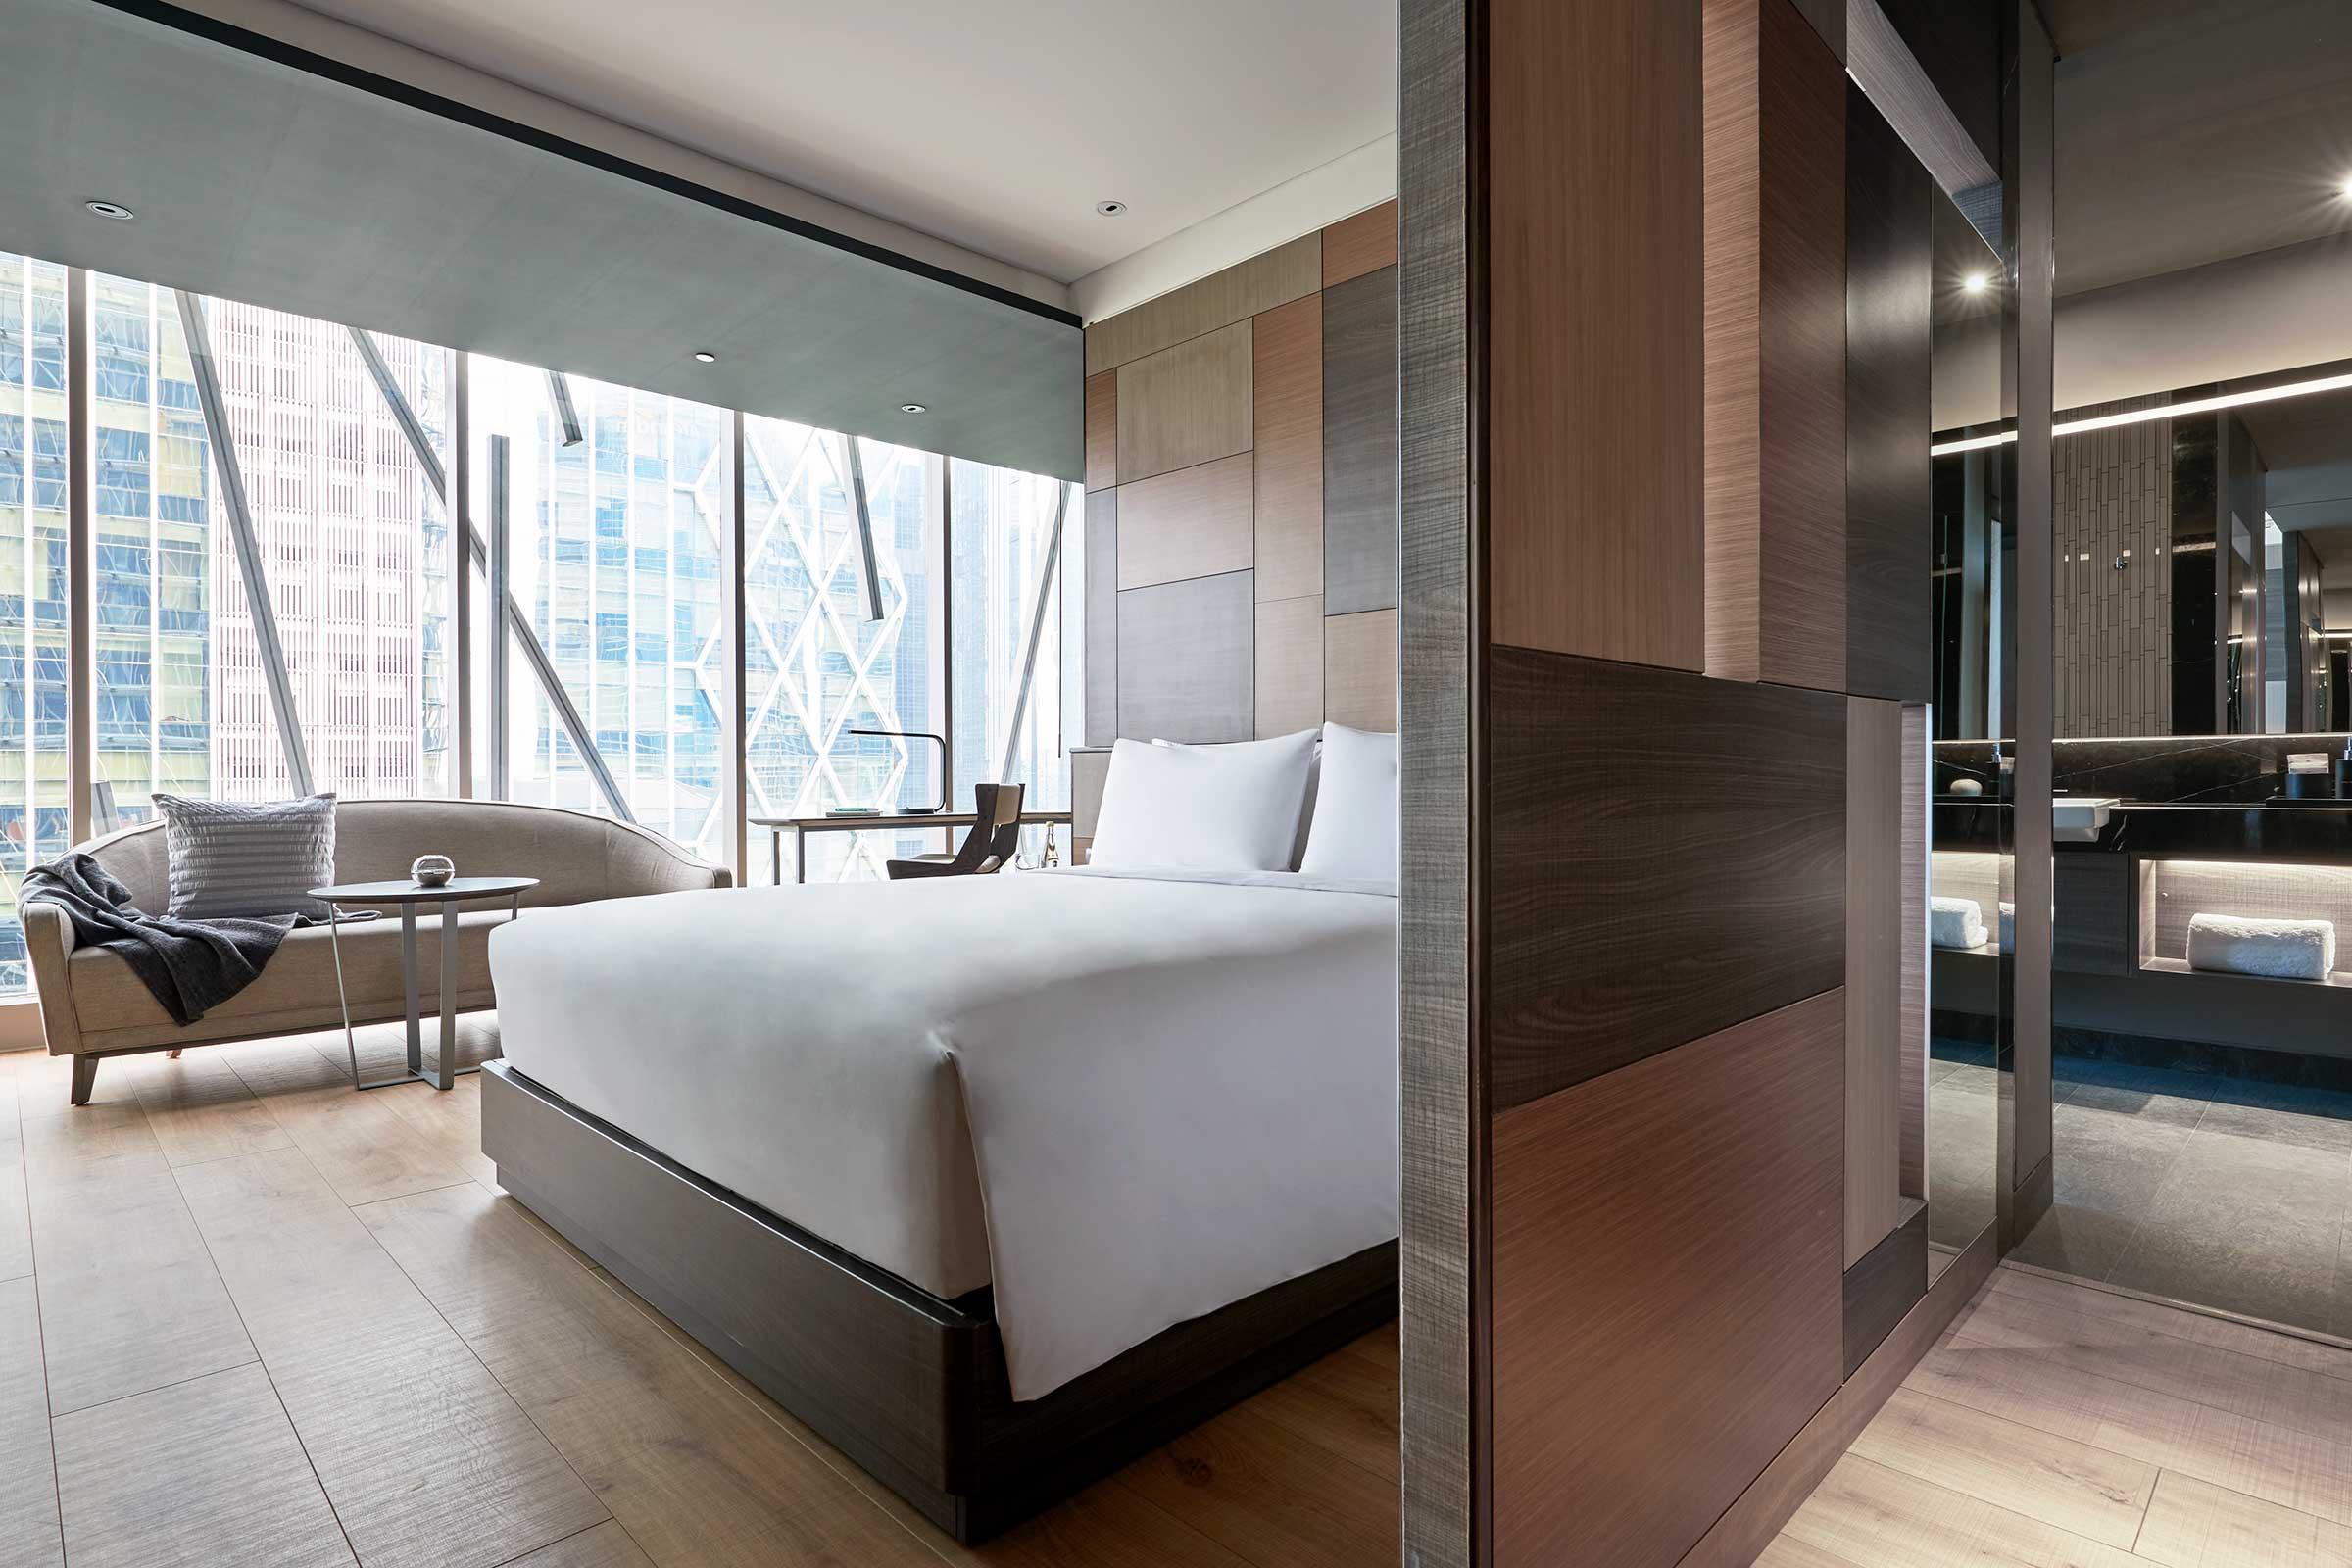 AJS---Accommodation---Studio-King-V1---Bedroom.jpg